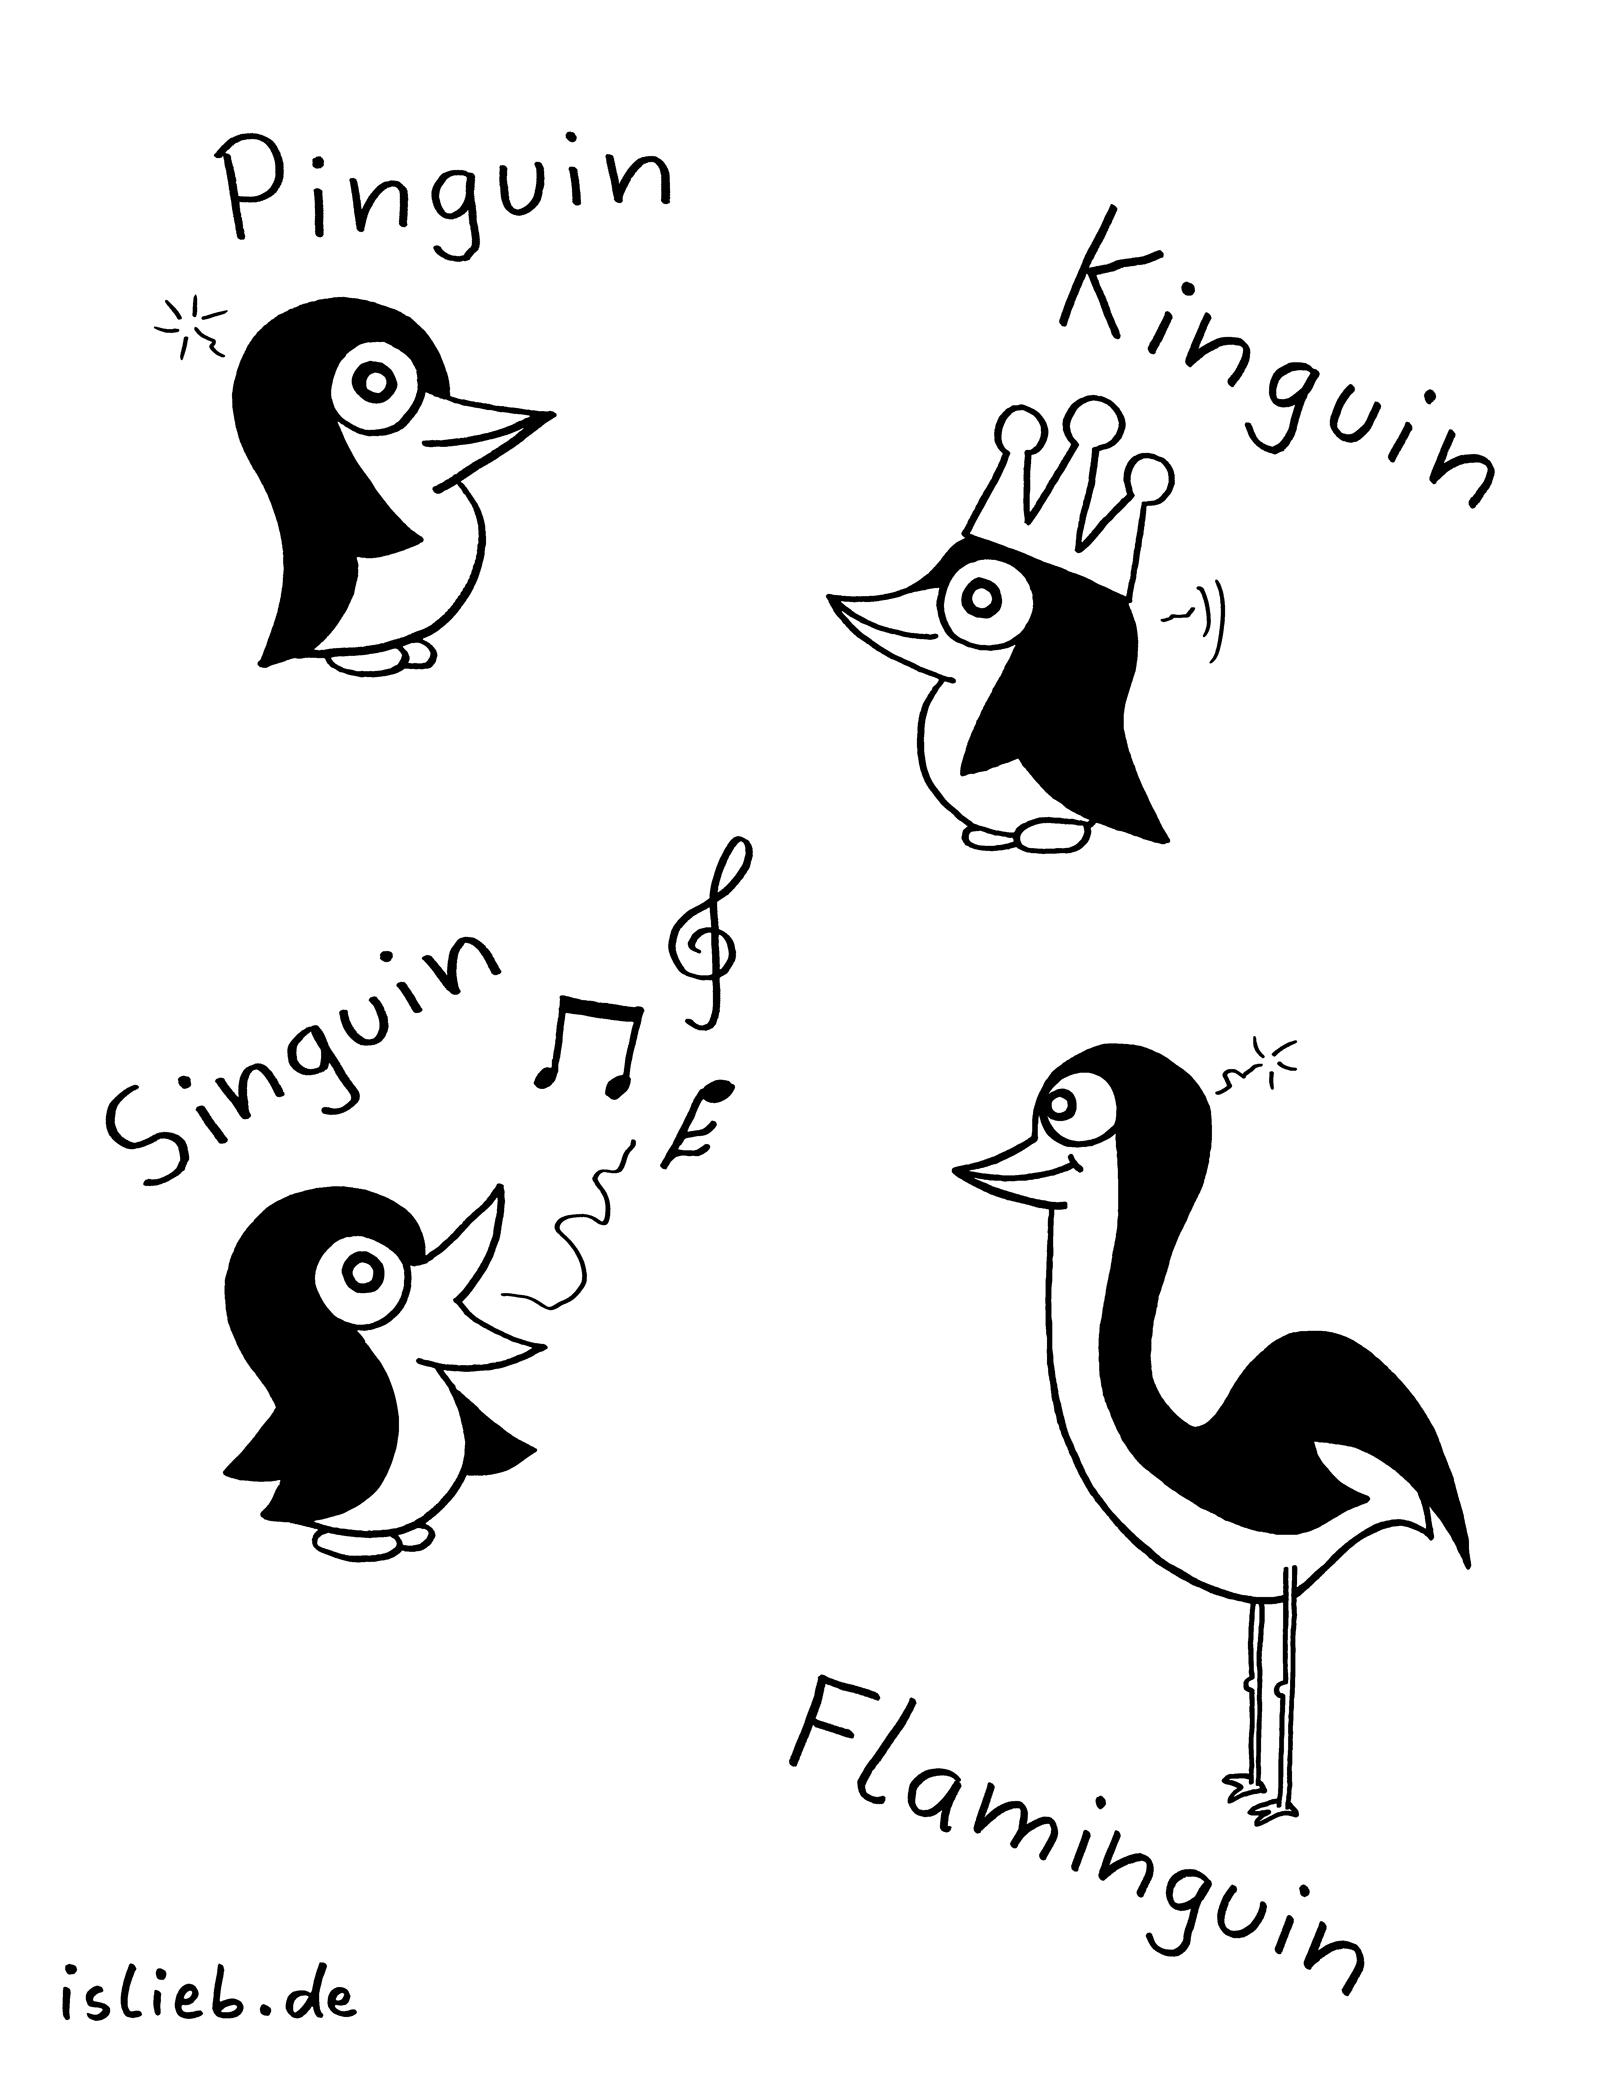 Pinguine islieb Comic